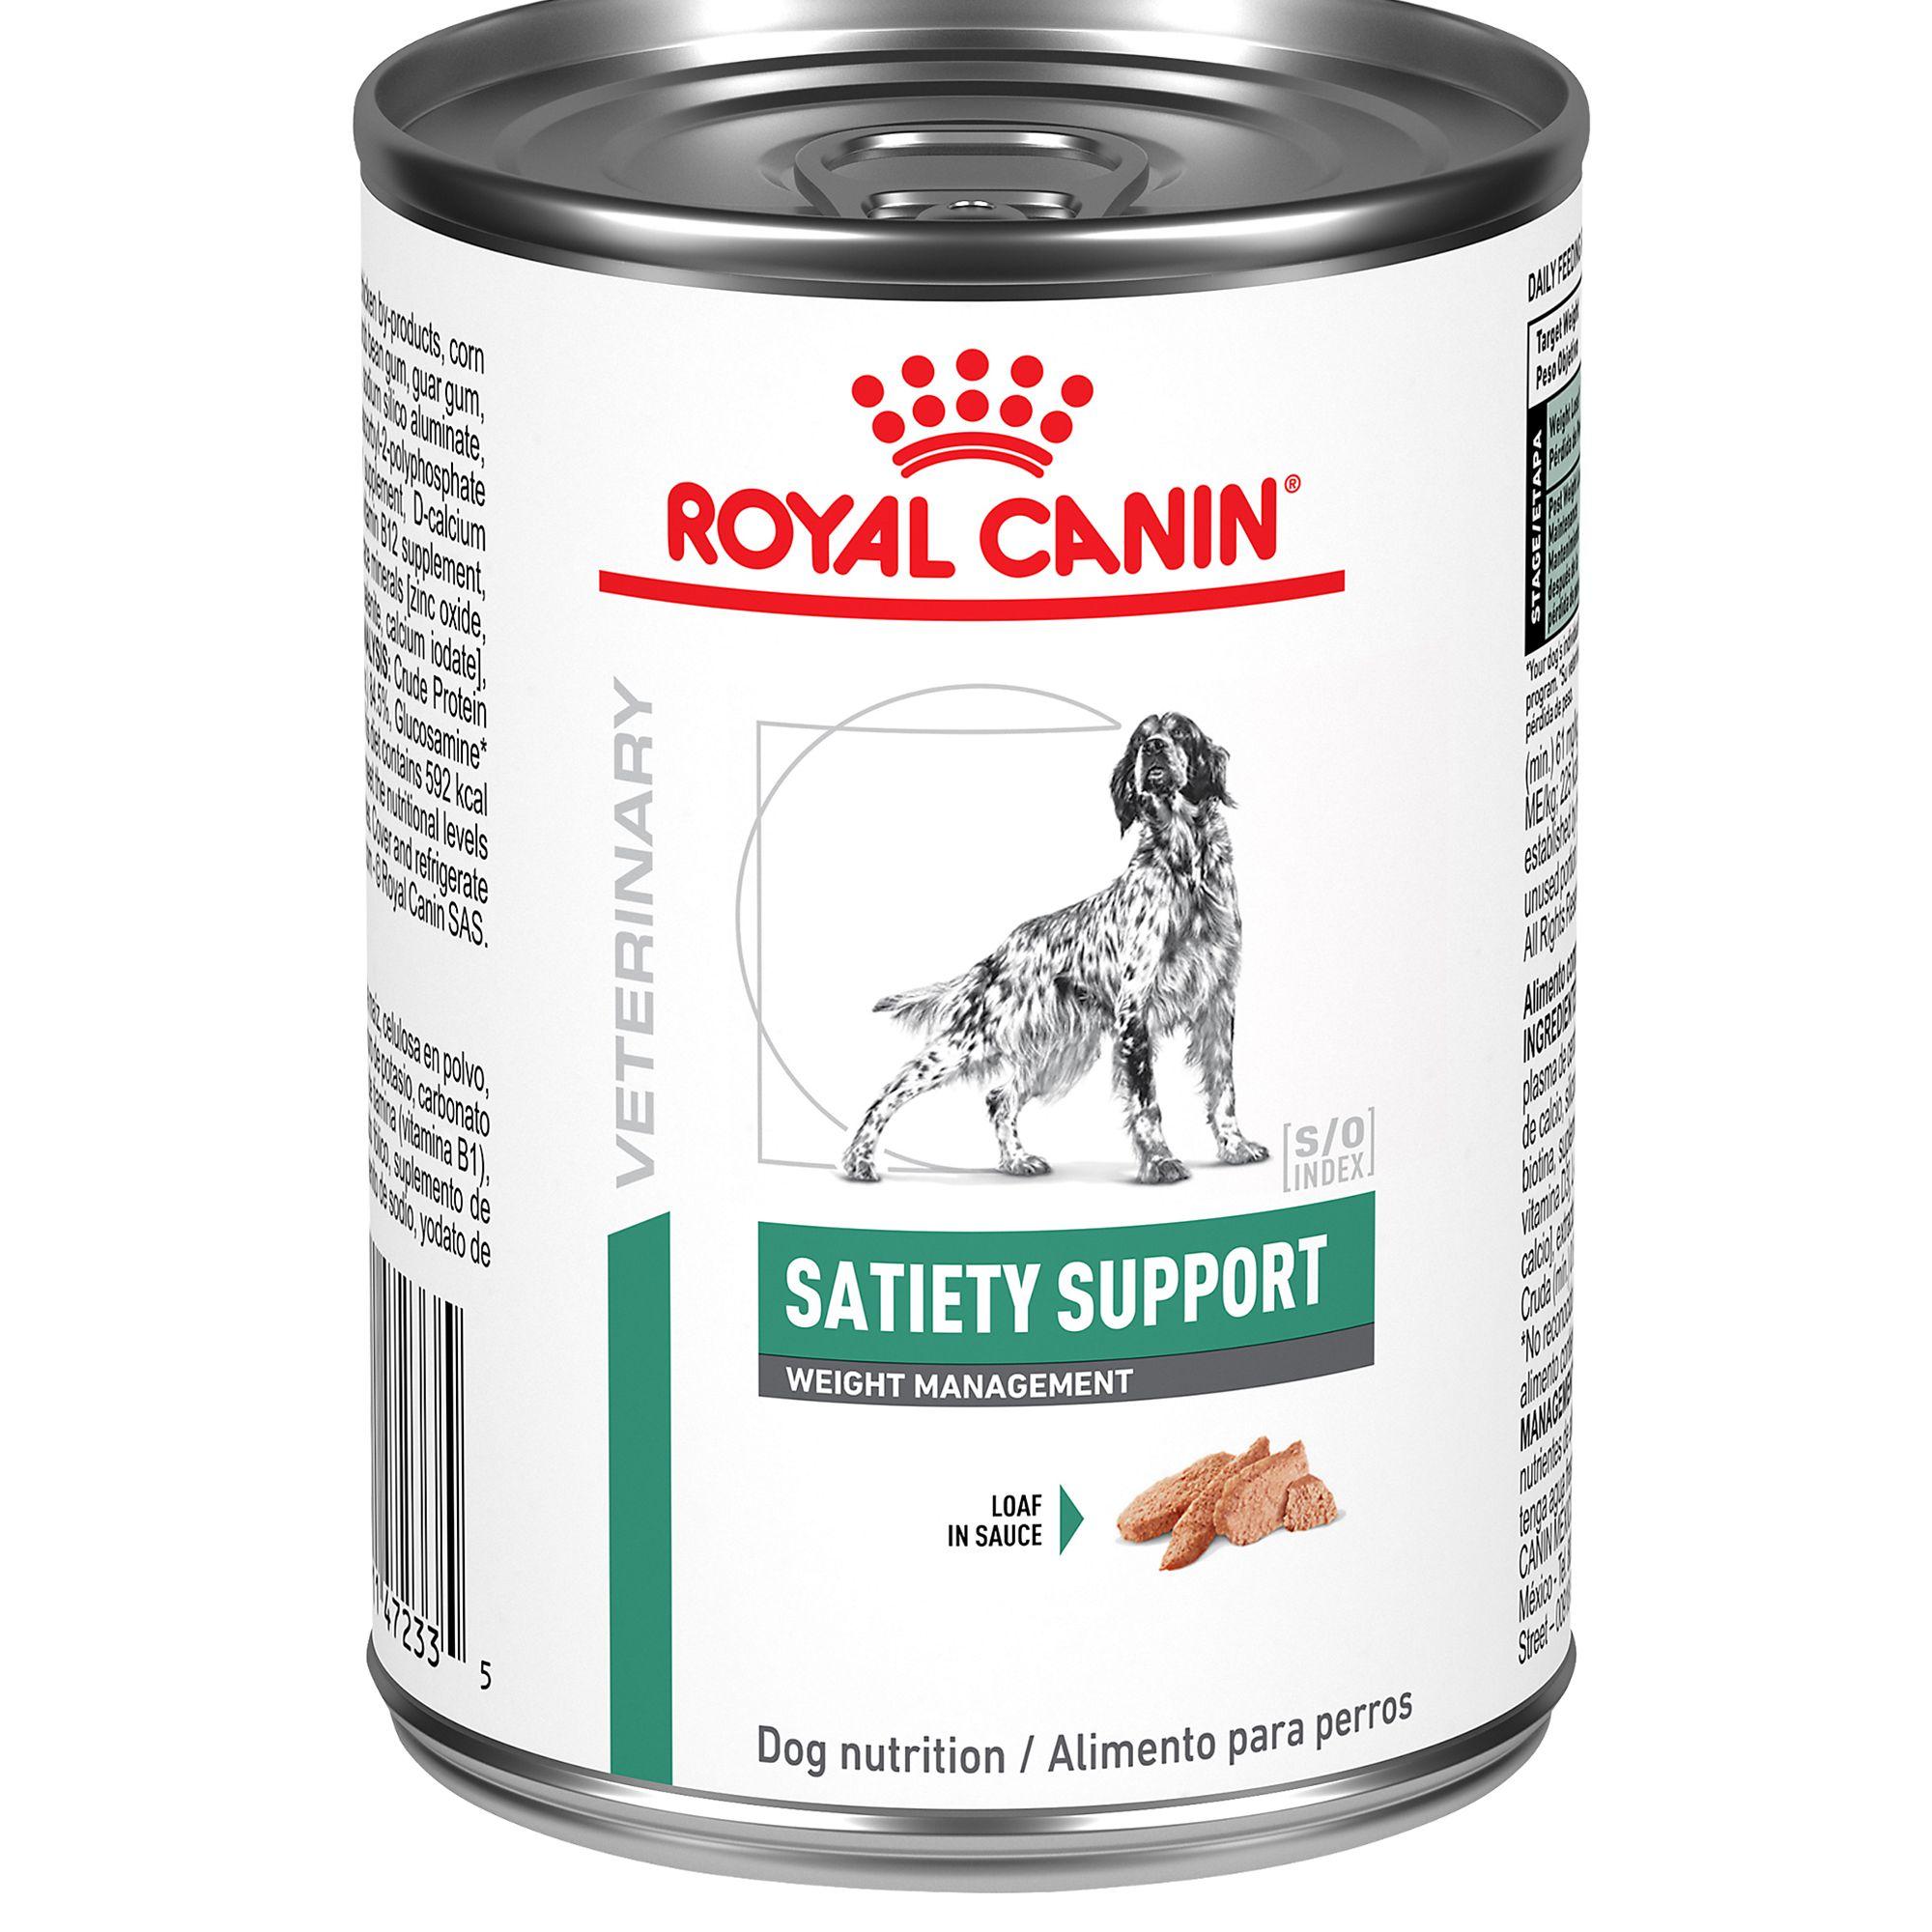 Royal Canin Dog Food Serving Size